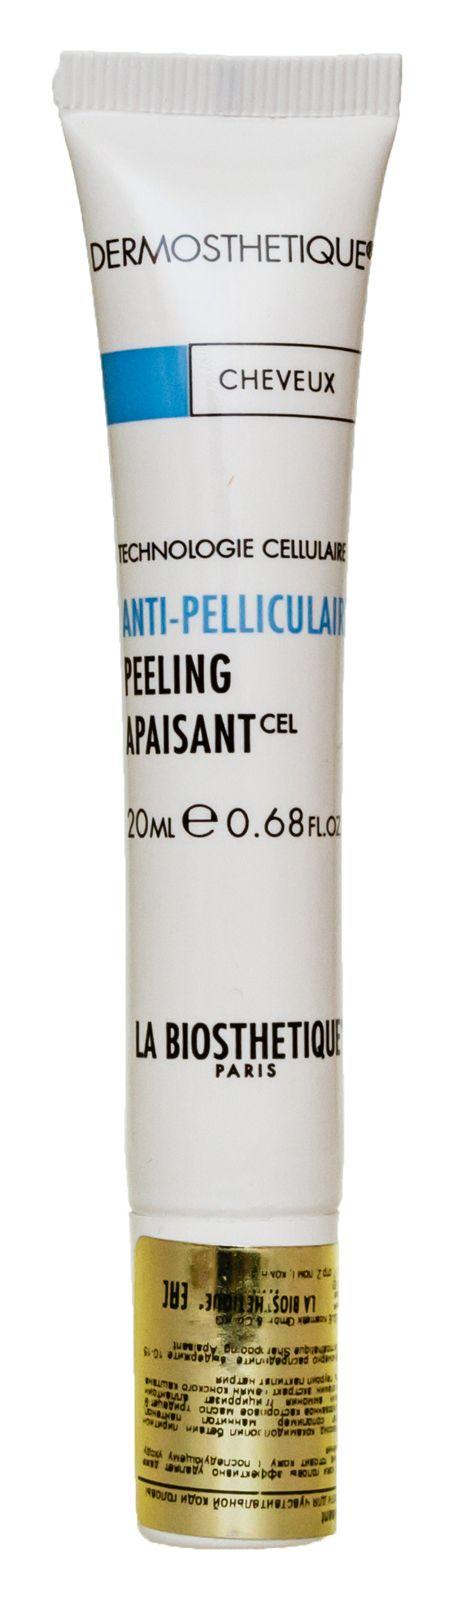 La Biosthetique Peeling Apaisant - Пилинг против перхоти 20 мл недорого